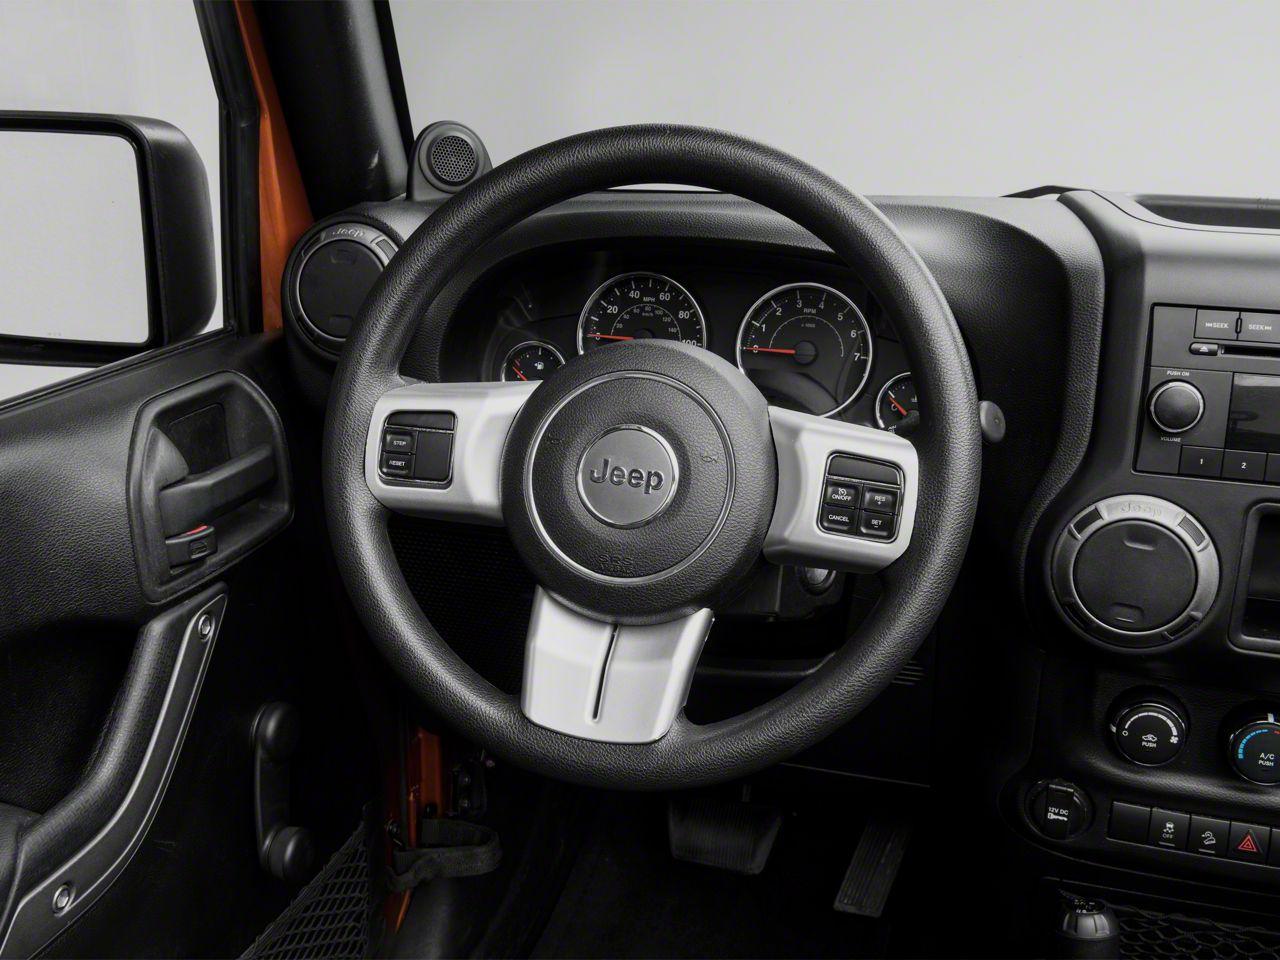 Rugged Ridge Steering Wheel Trim - Brushed Silver (11-18 Jeep Wrangler JK)